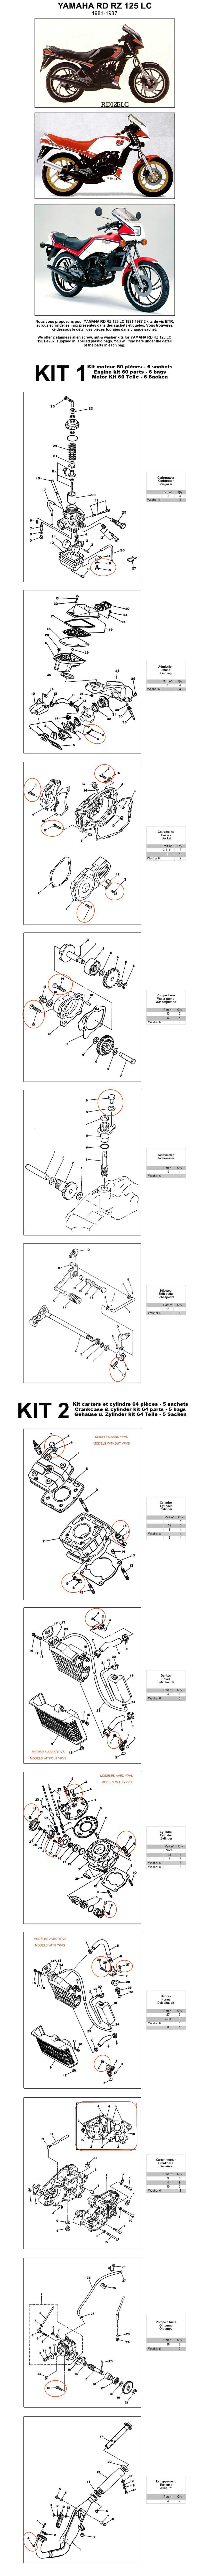 Cb1100f Wiring Diagram 1983 Honda Cb1100 Super Sport Wiring